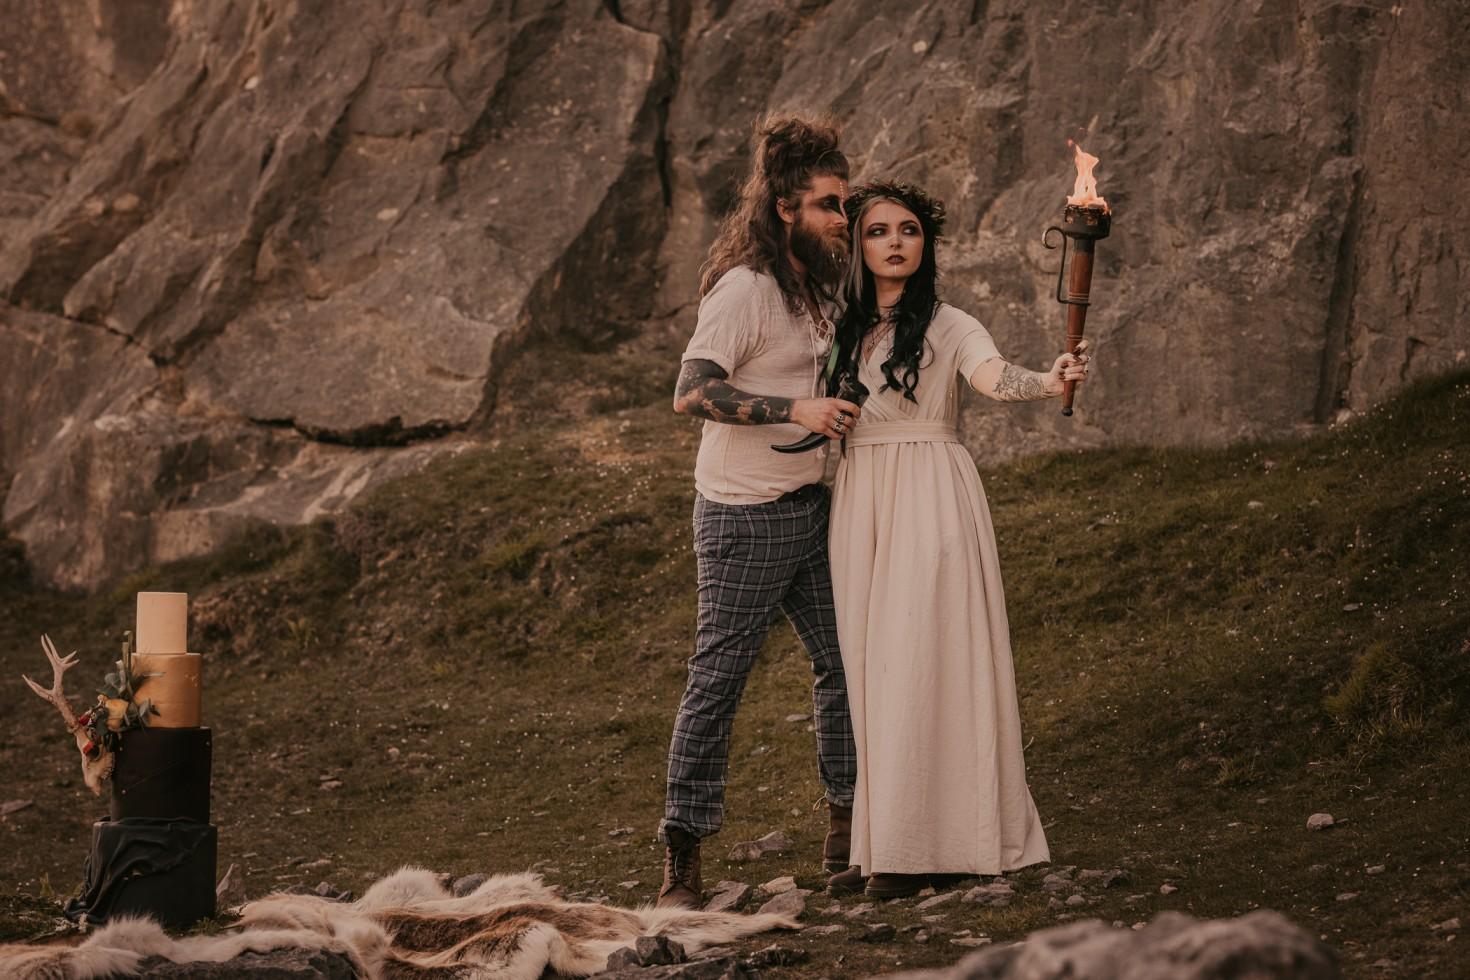 viking wedding - wild wedding - alternative wedding styling - viking elopement - bohemian micro wedding - edgy outdoor wedding